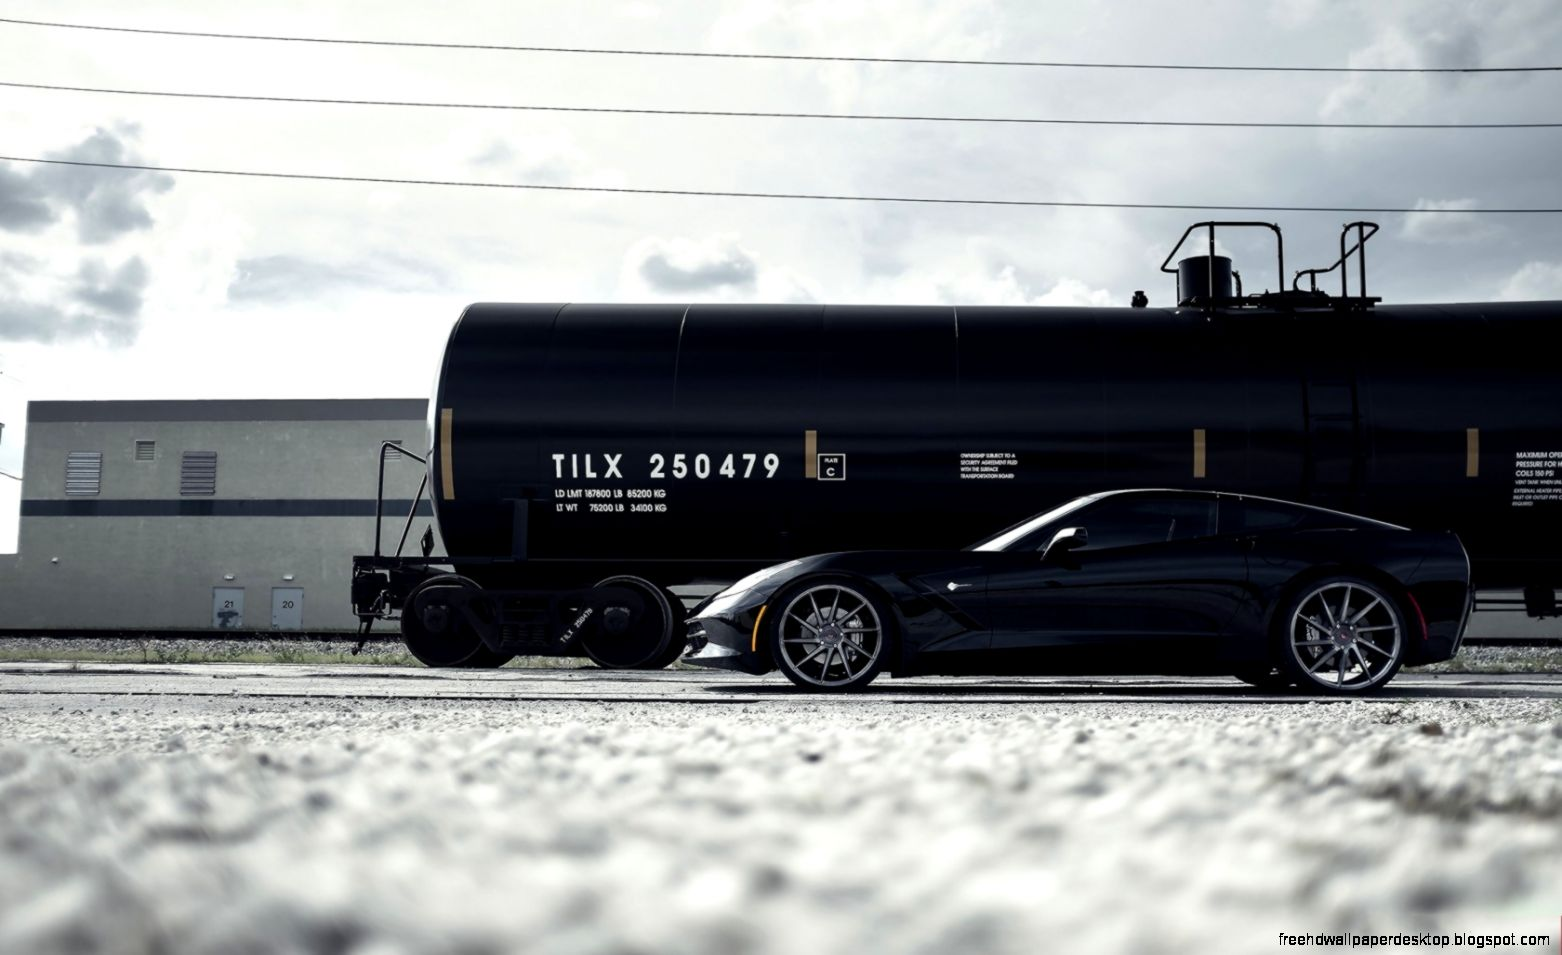 View Original Size Chevrolet Corvette Stingray C7 Wallpaper 1600x900 249380